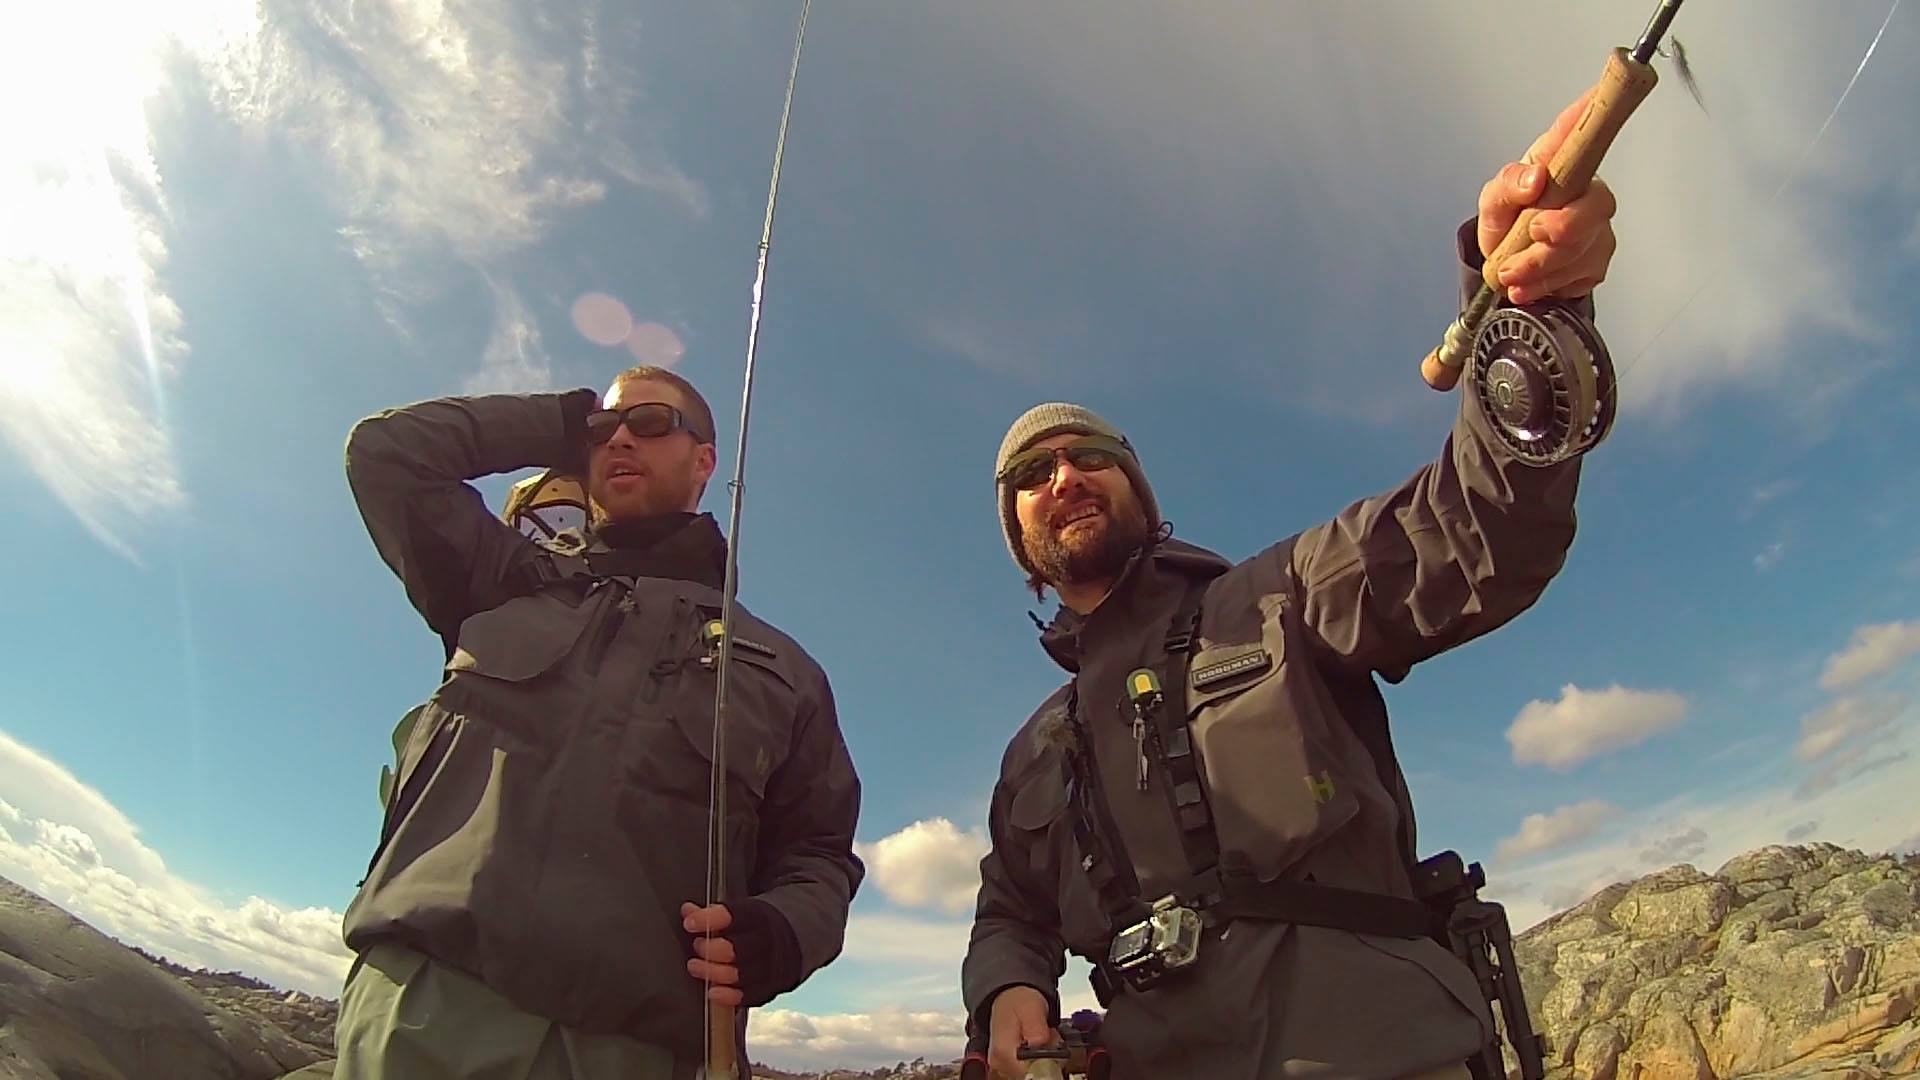 Stian og David tar oss med på sjøørretfiske i Kragerø skjærgården